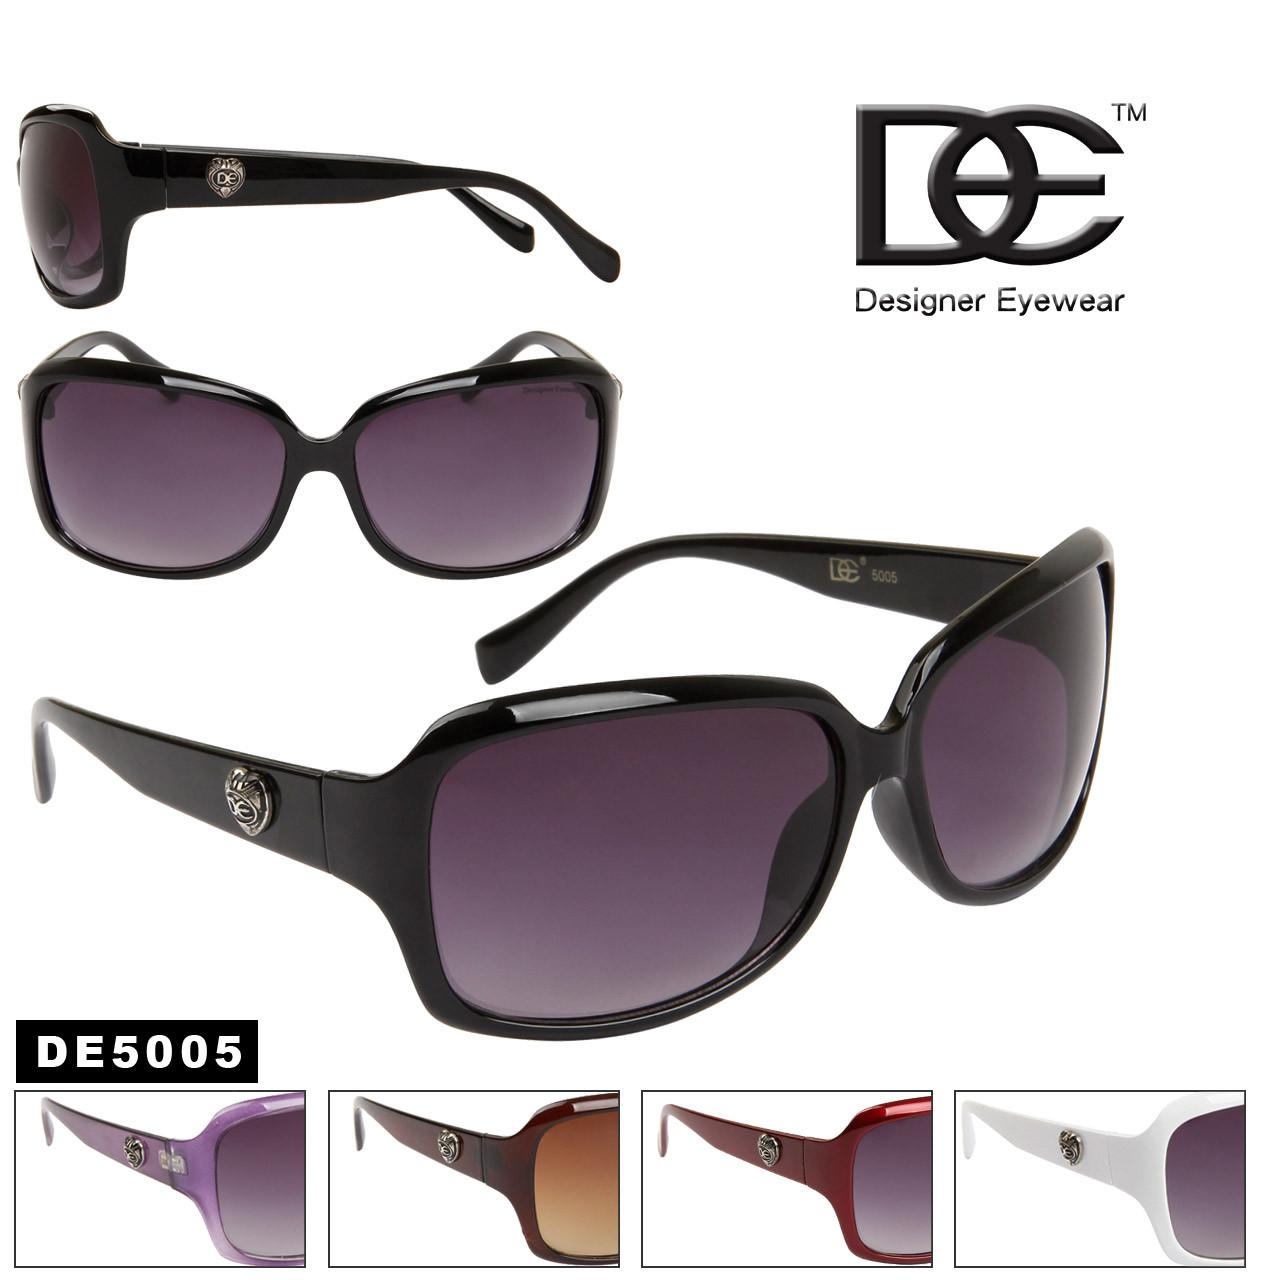 DE™ Designer Eyewear DE5005